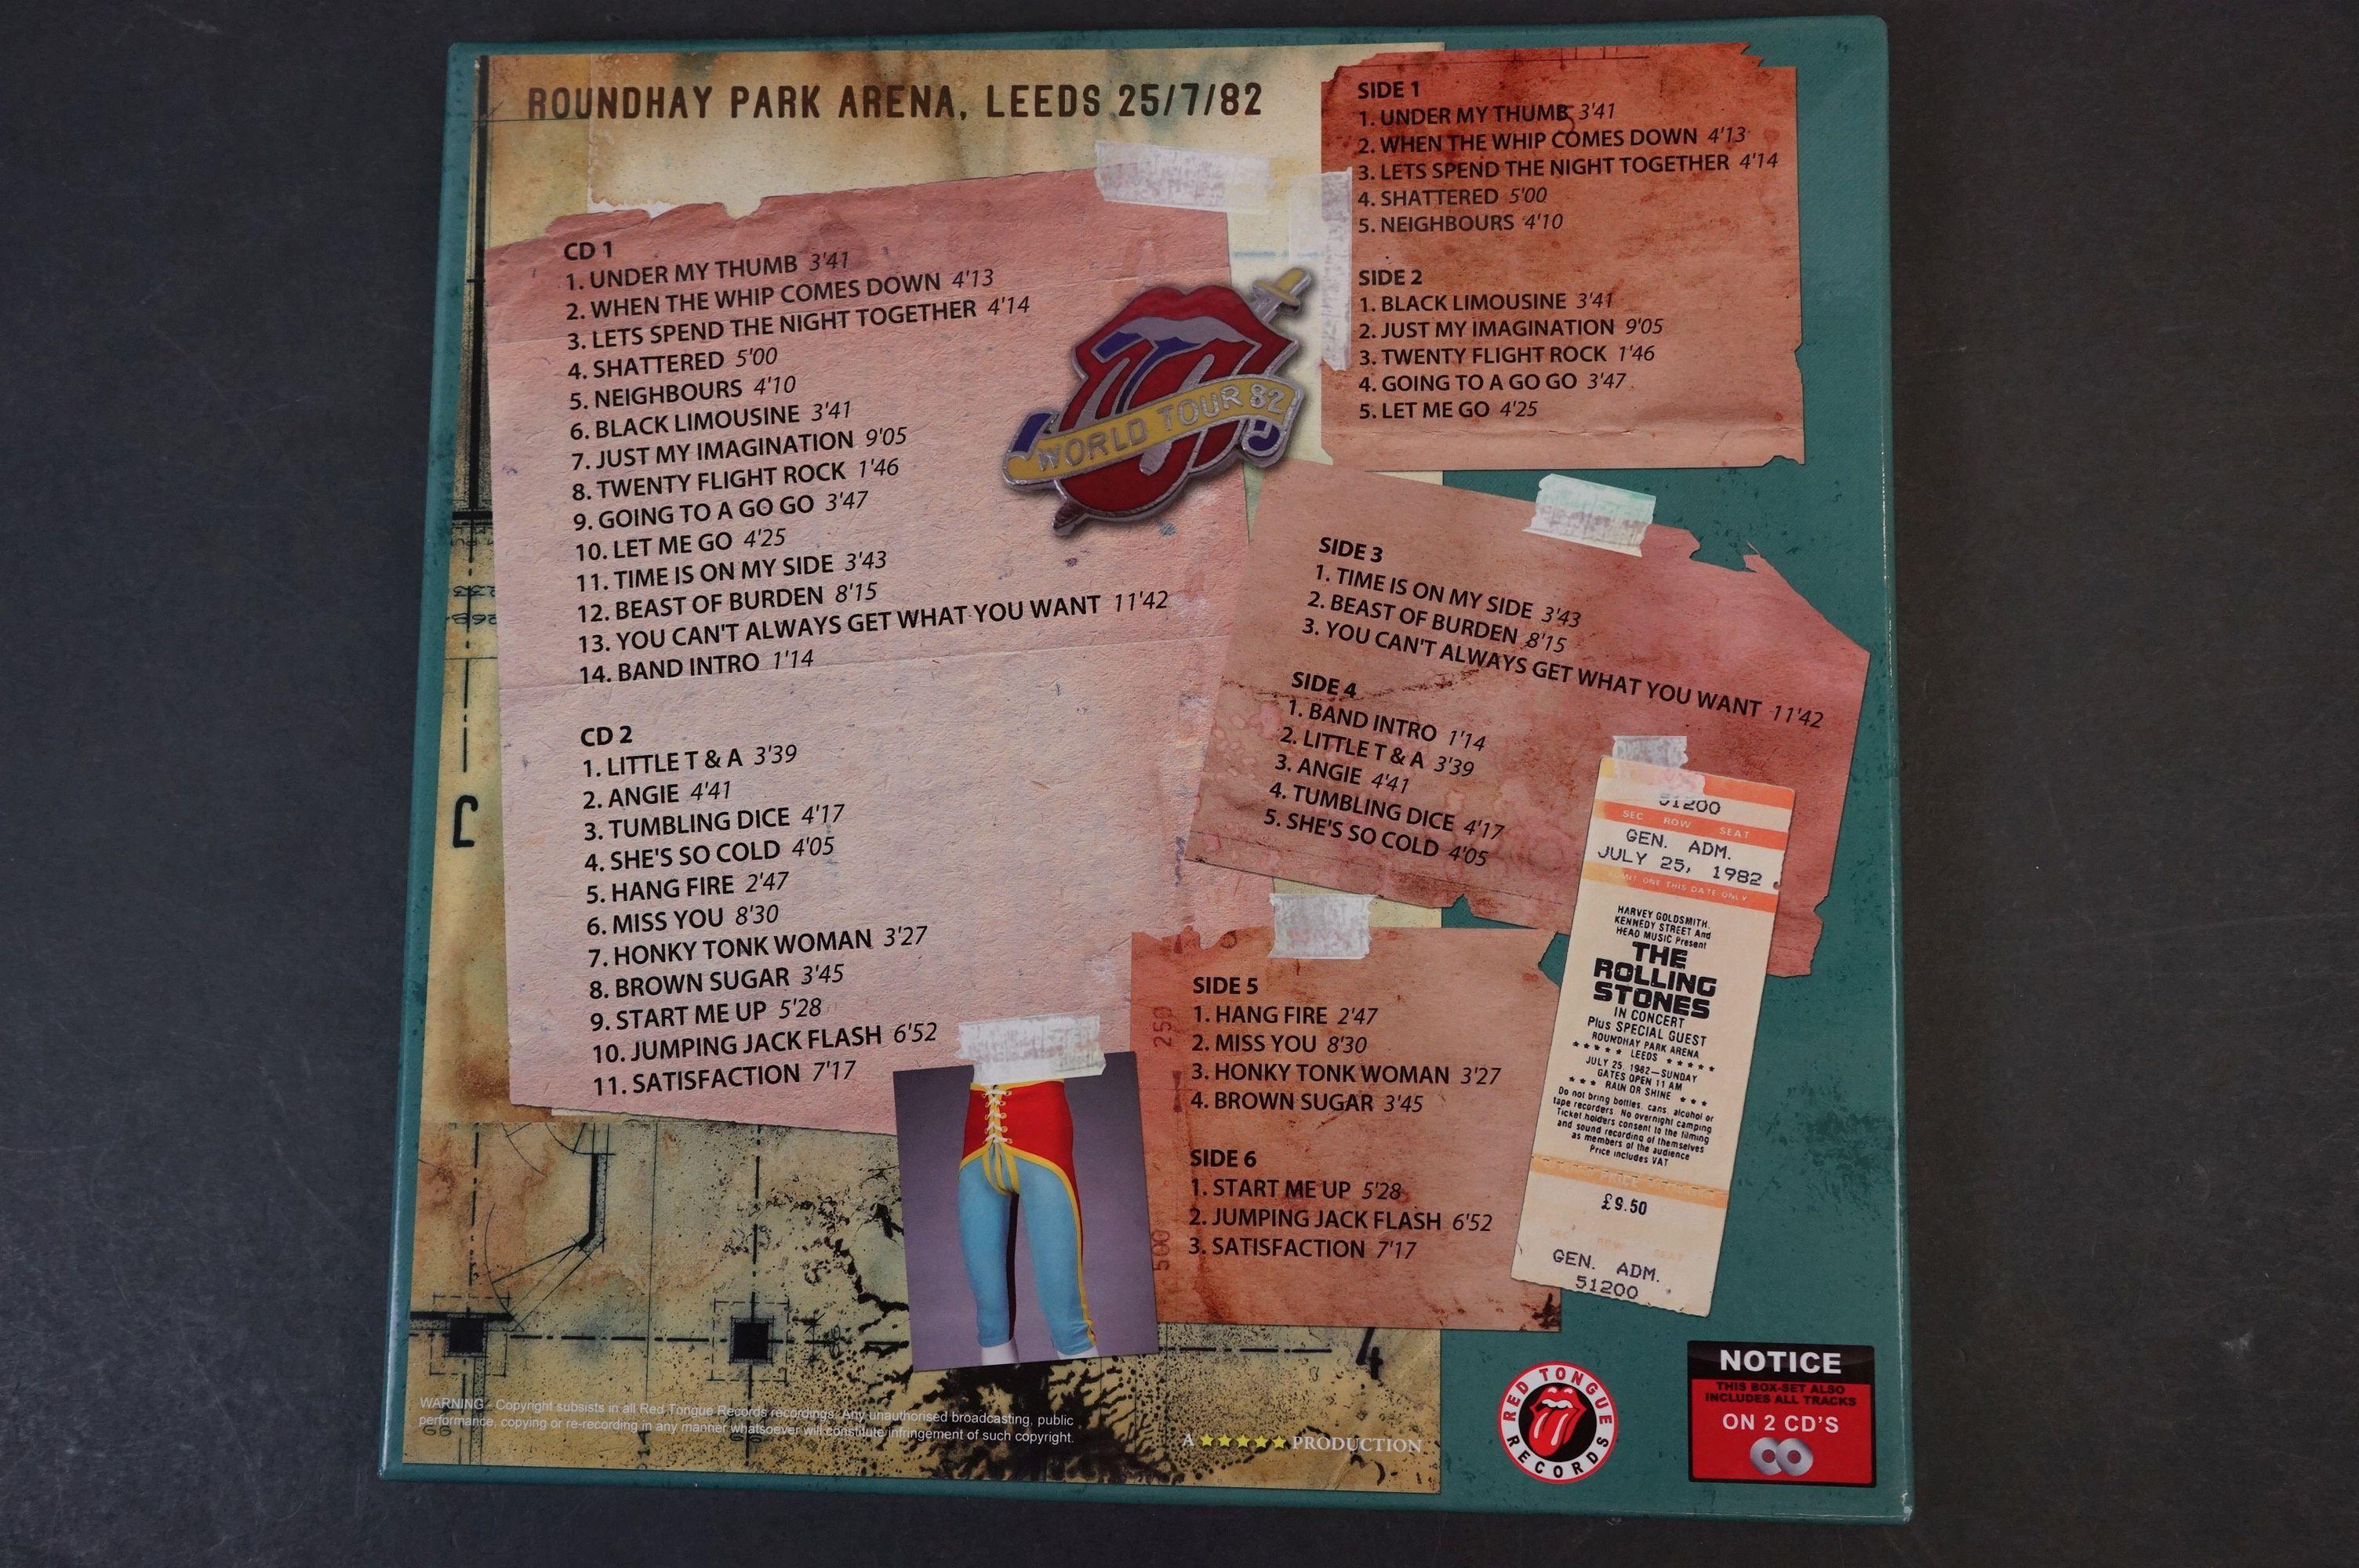 Vinyl - ltd edn The Real Alternate Album Rolling Stones Leeds July 25 1982 3 LP / 2 CD Box Set RTR - Image 8 of 10